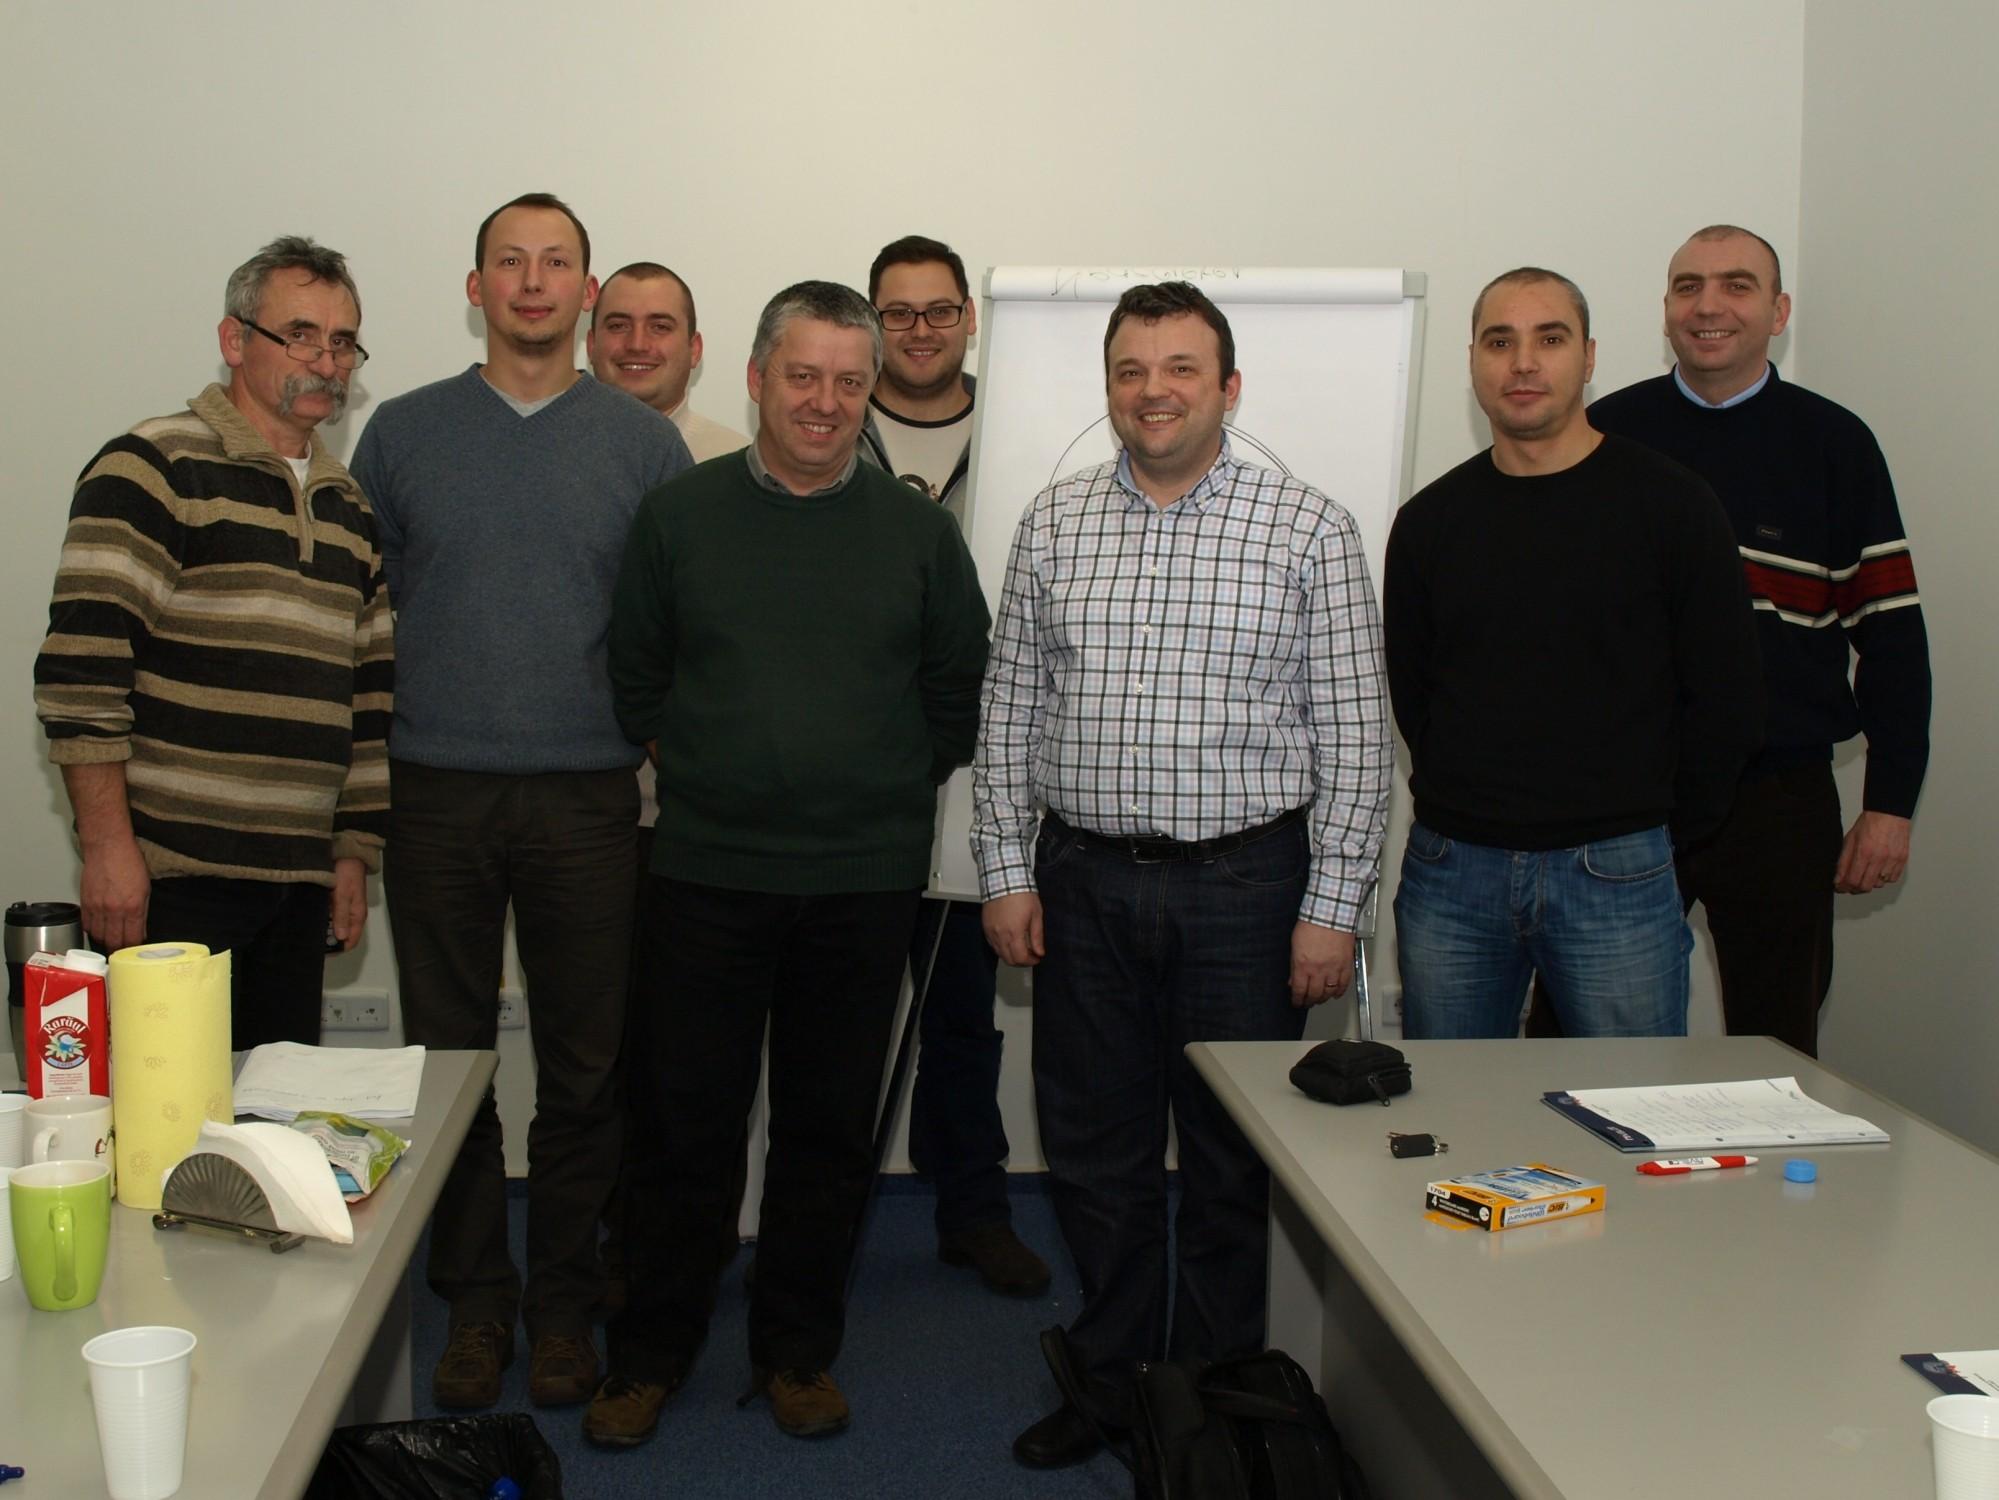 Impreuna cu echipa Nivelco Tehnica Masurarii - Targu Mures